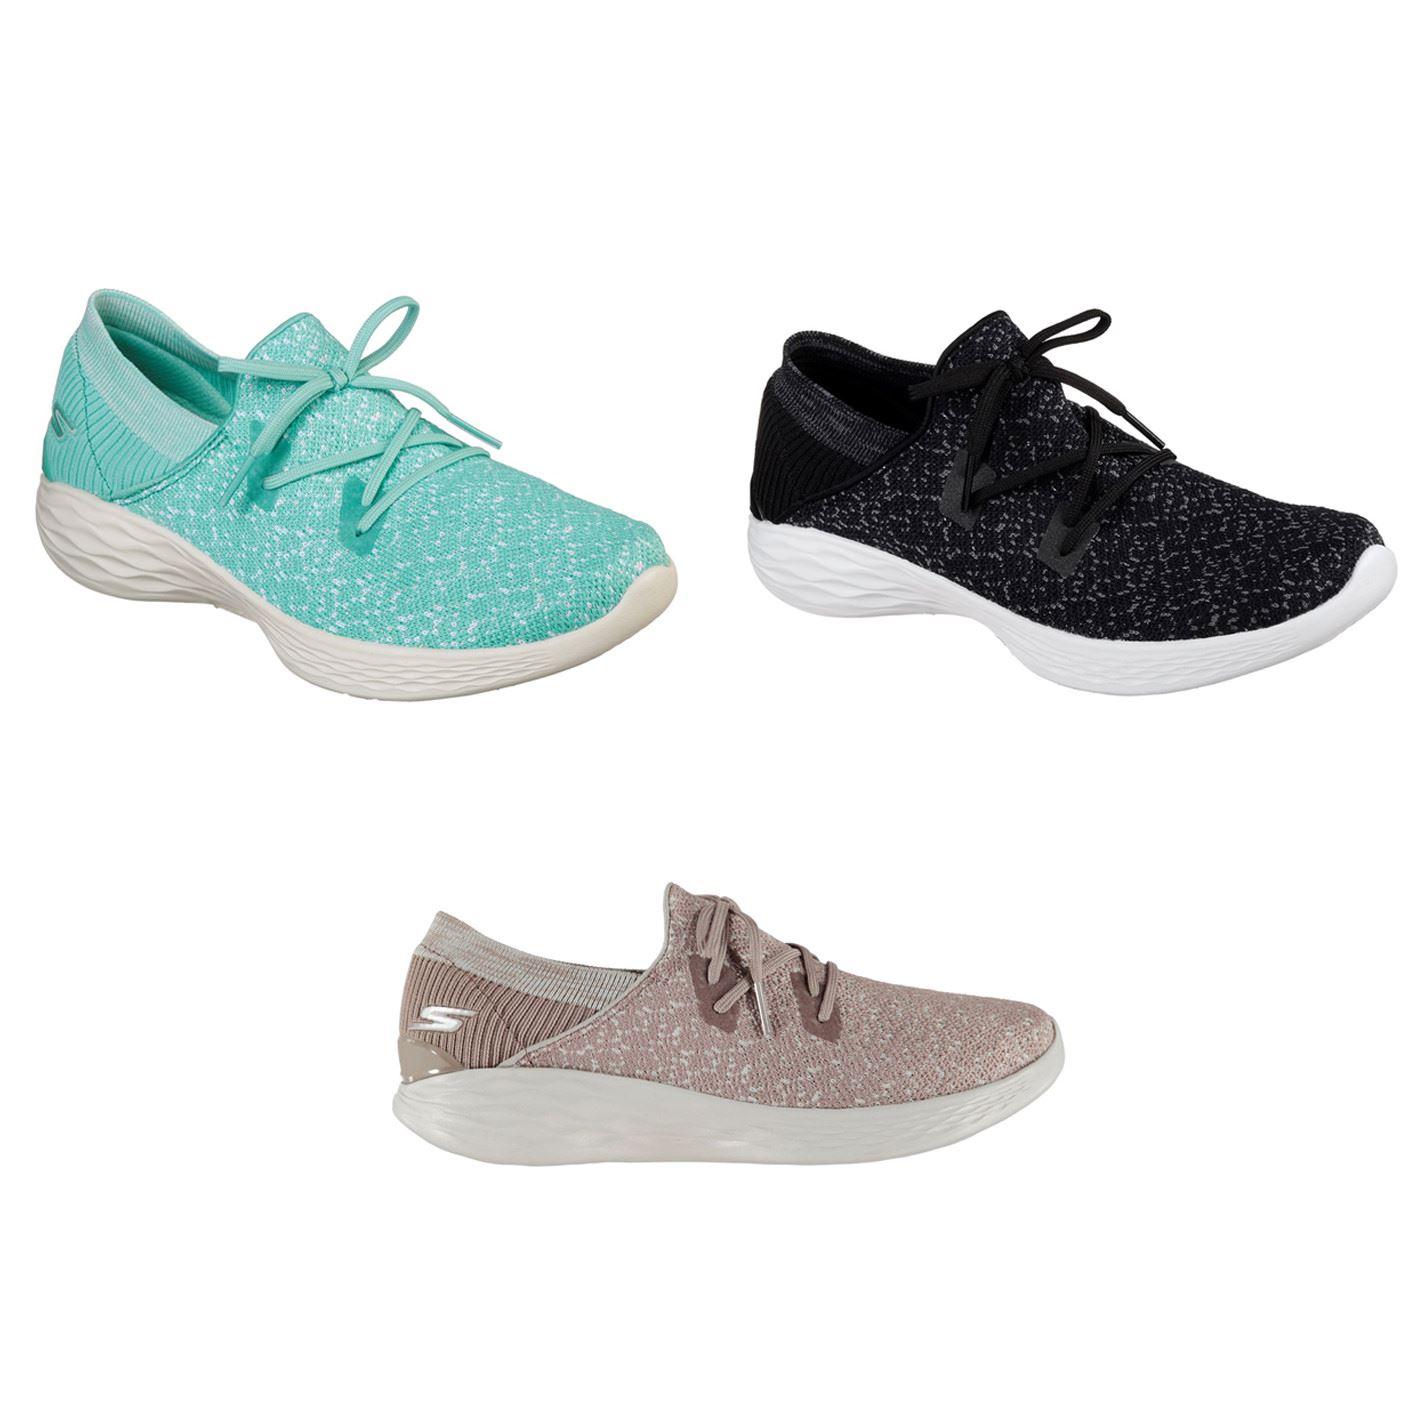 Skechers YOU Exhale Trainers Ladies Shoes Mauve Sports